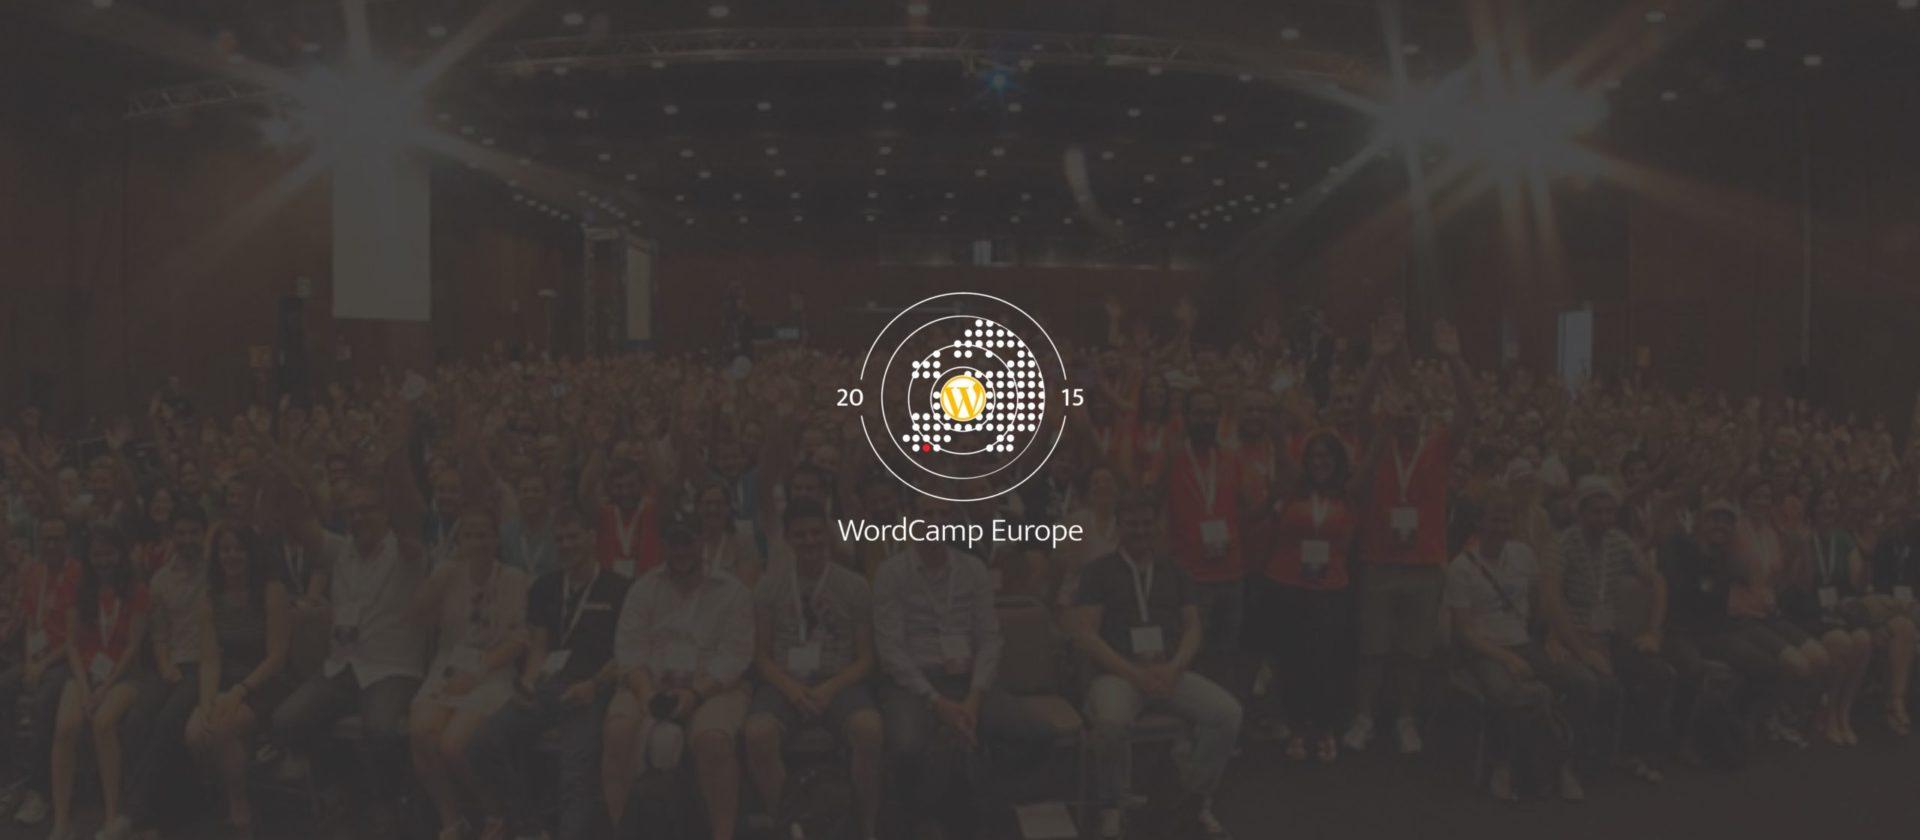 WordCamp Europ 2015 in Sevilla